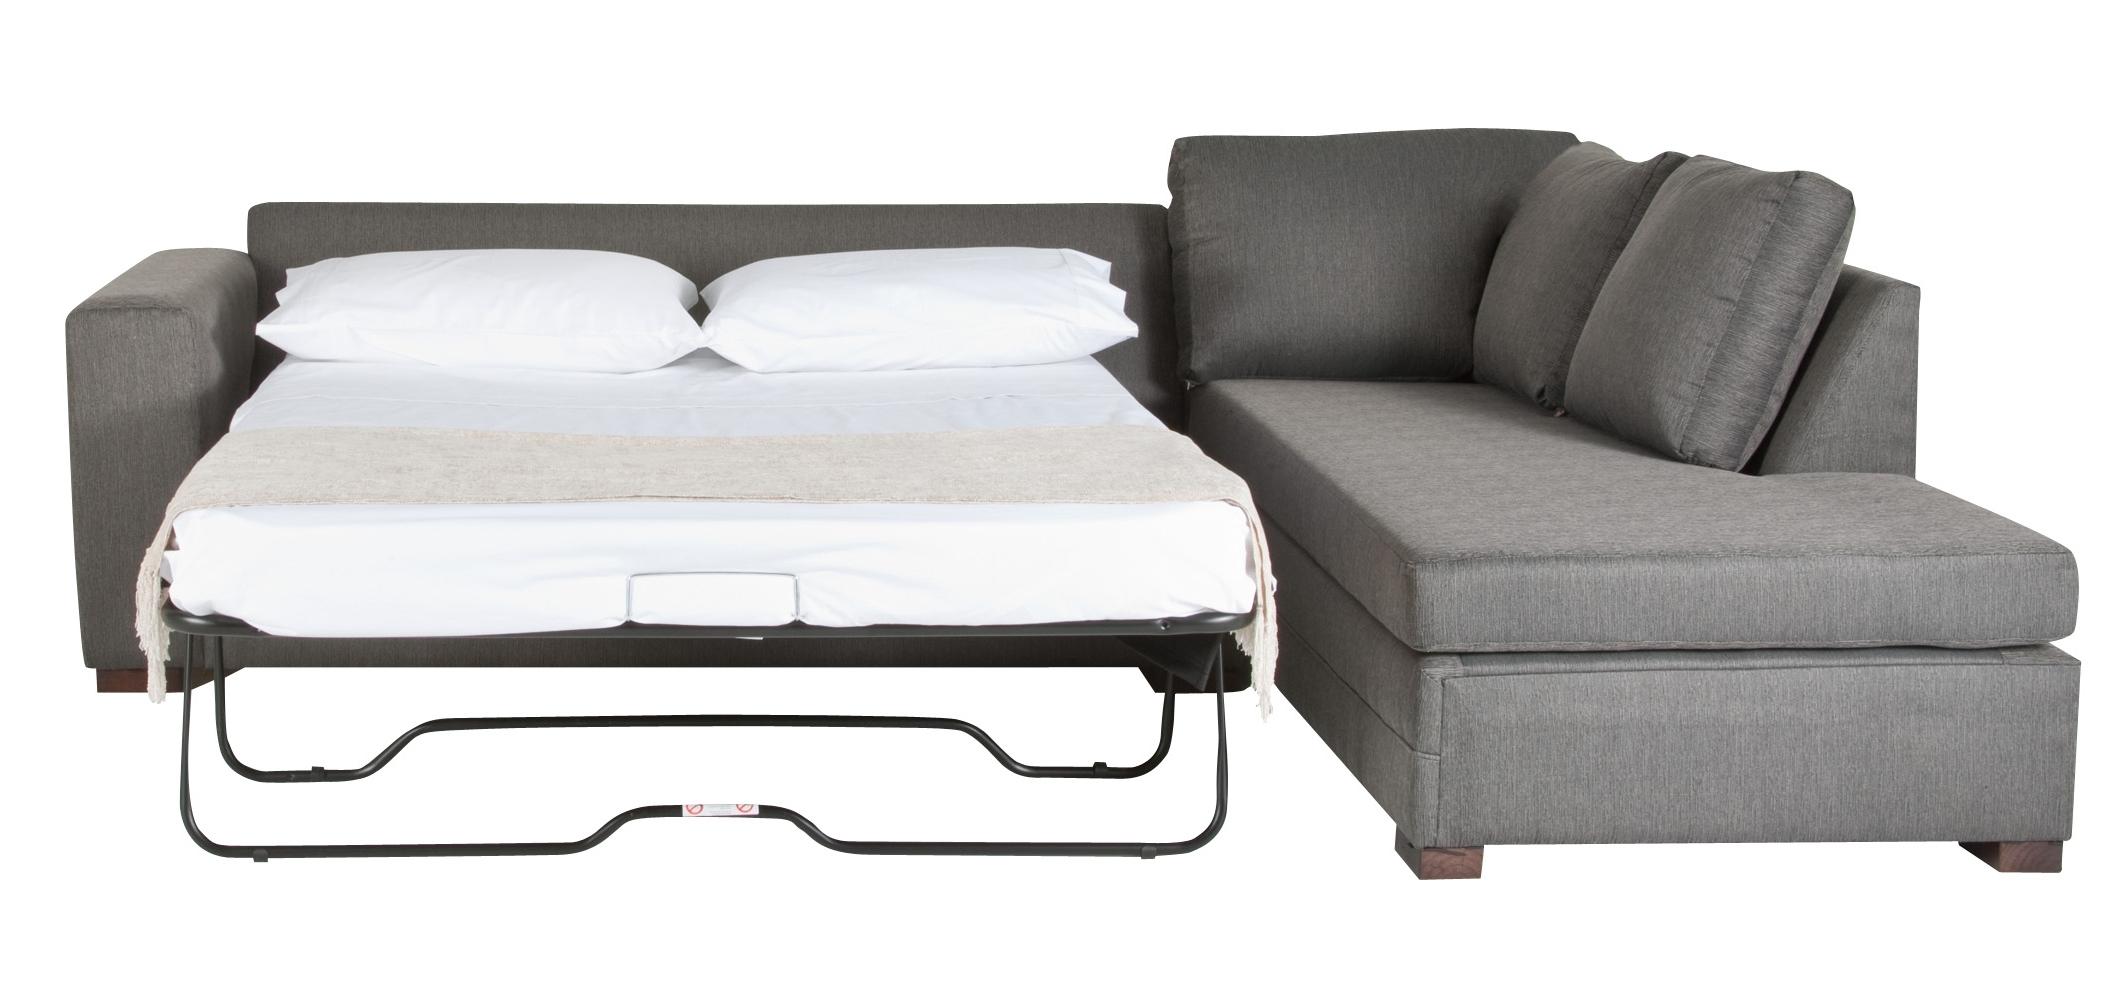 Aifaresidency With Regard To Well Known Ikea Loveseat Sleeper Sofas (View 4 of 20)